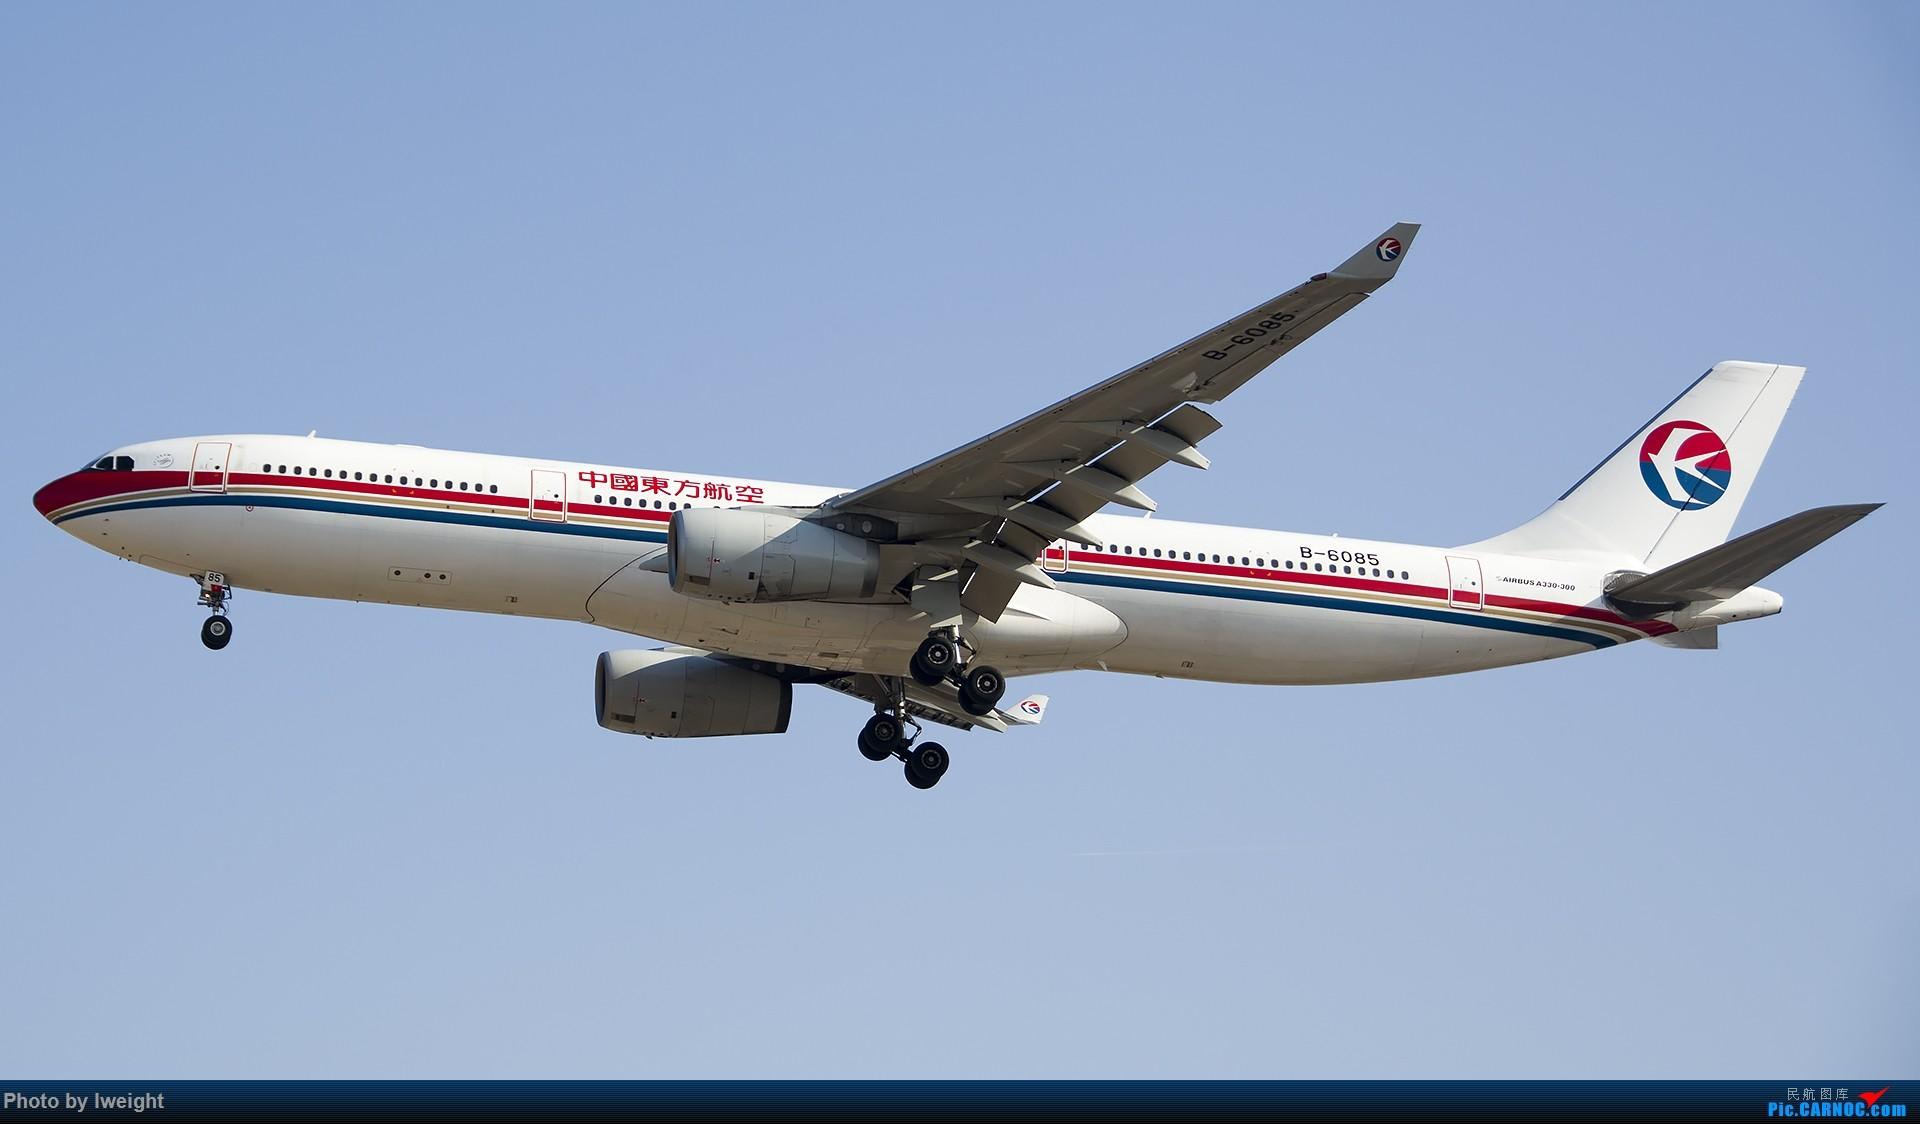 Re:[原创]庆祝升级777,发上今天在首都机场拍的所有飞机【2014-12-14】 AIRBUS A330-300 B-6085 中国北京首都国际机场